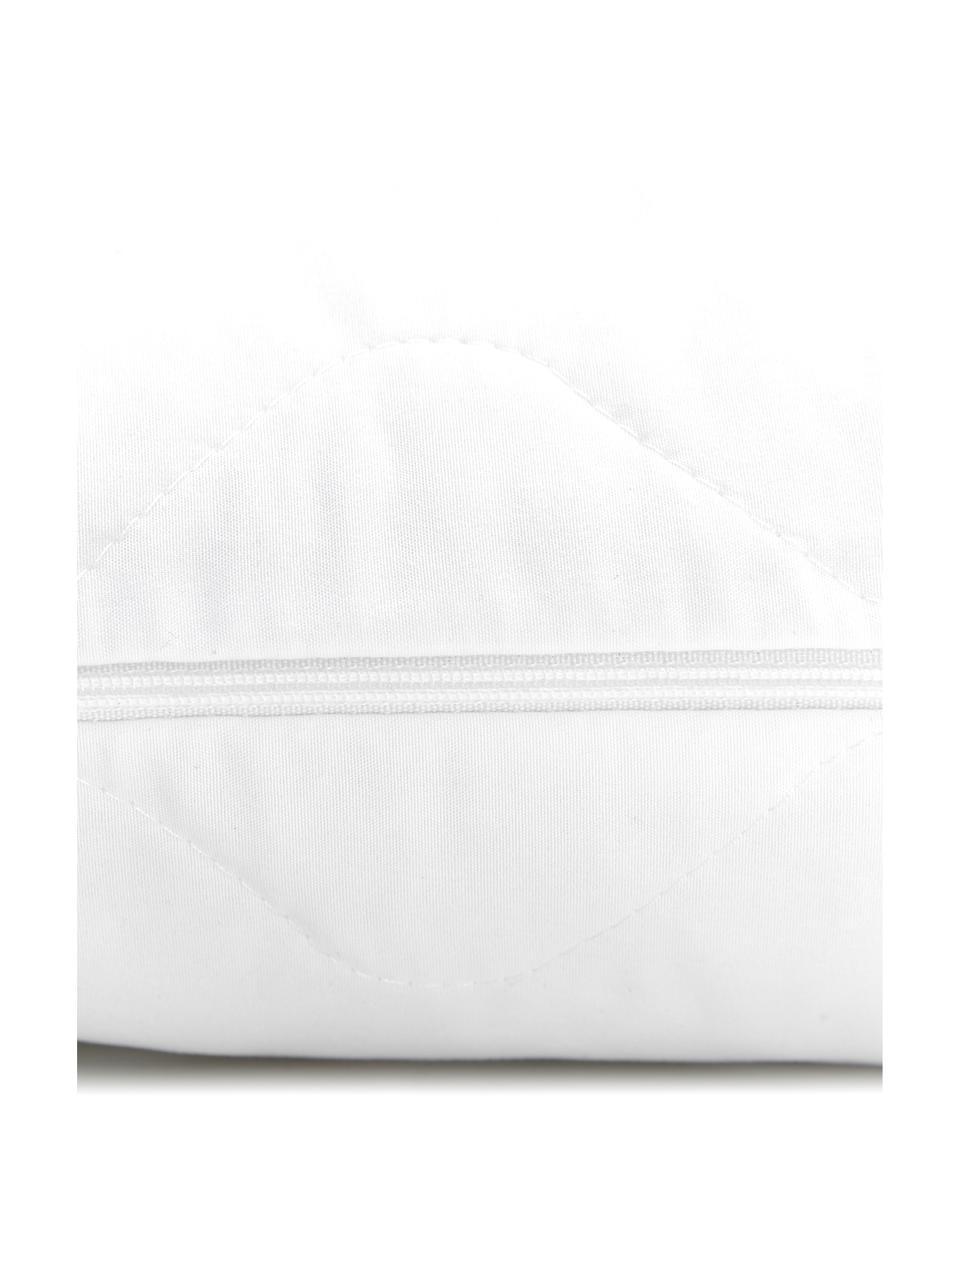 Premium kussenvulling Sia, 40x40, microvezel vulling, Wit, 40 x 40 cm